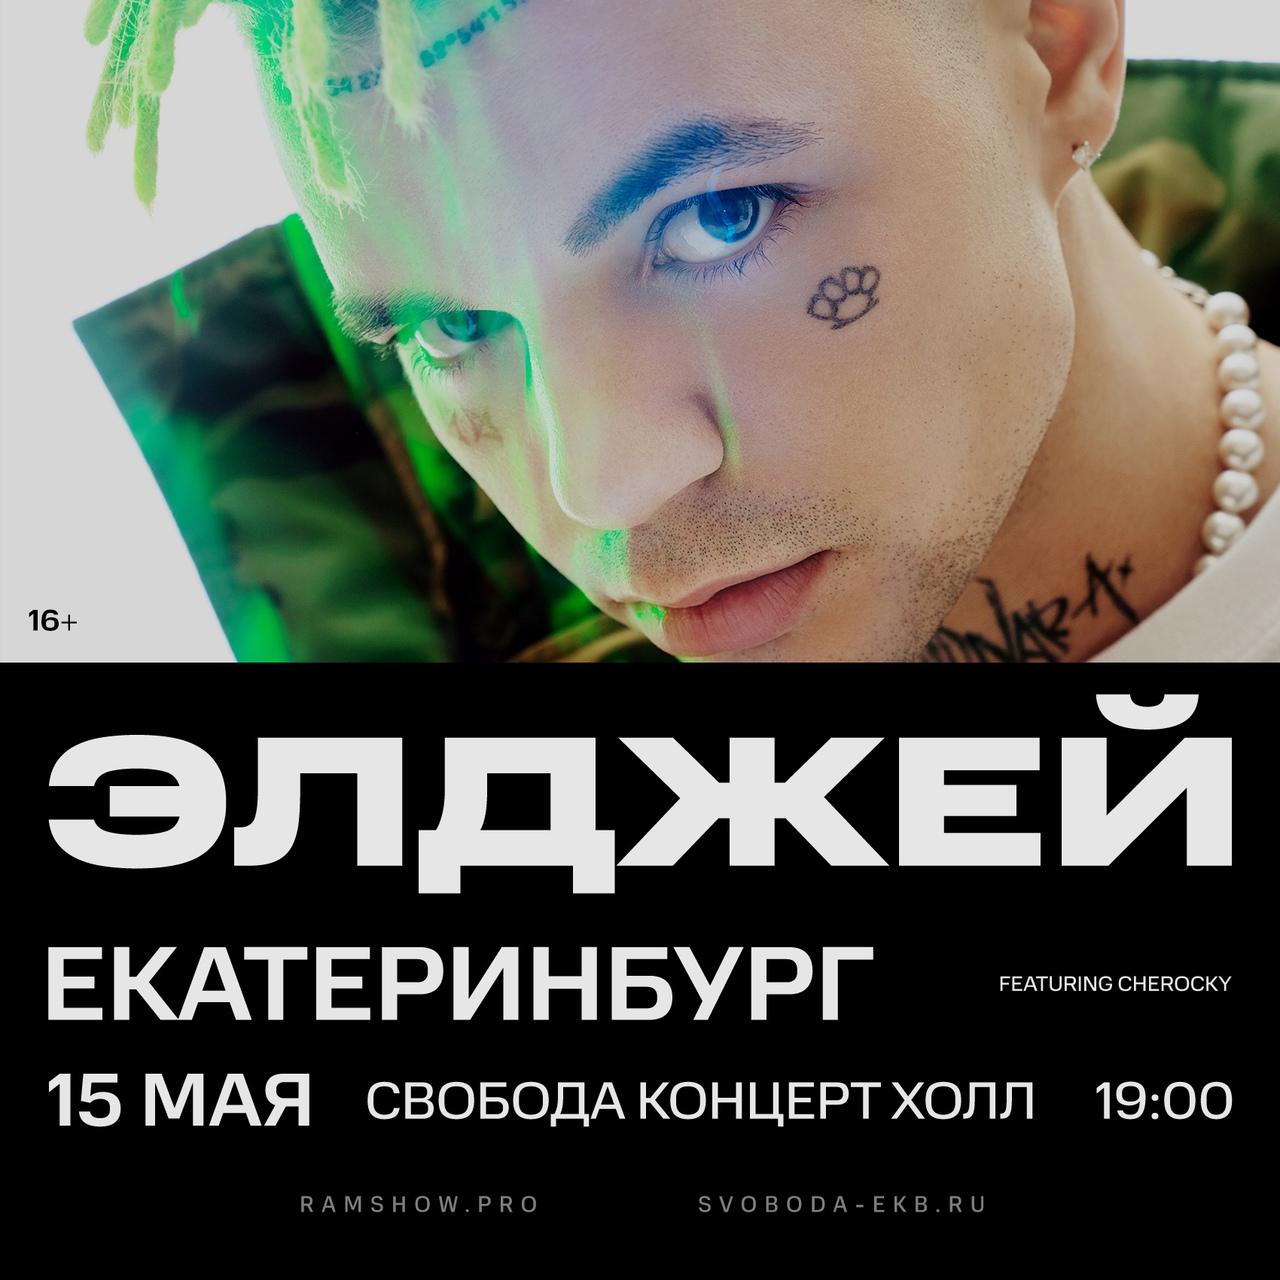 Афиша Екатеринбург ЭЛДЖЕЙ / 15 МАЯ / СВОБОДА / Екб